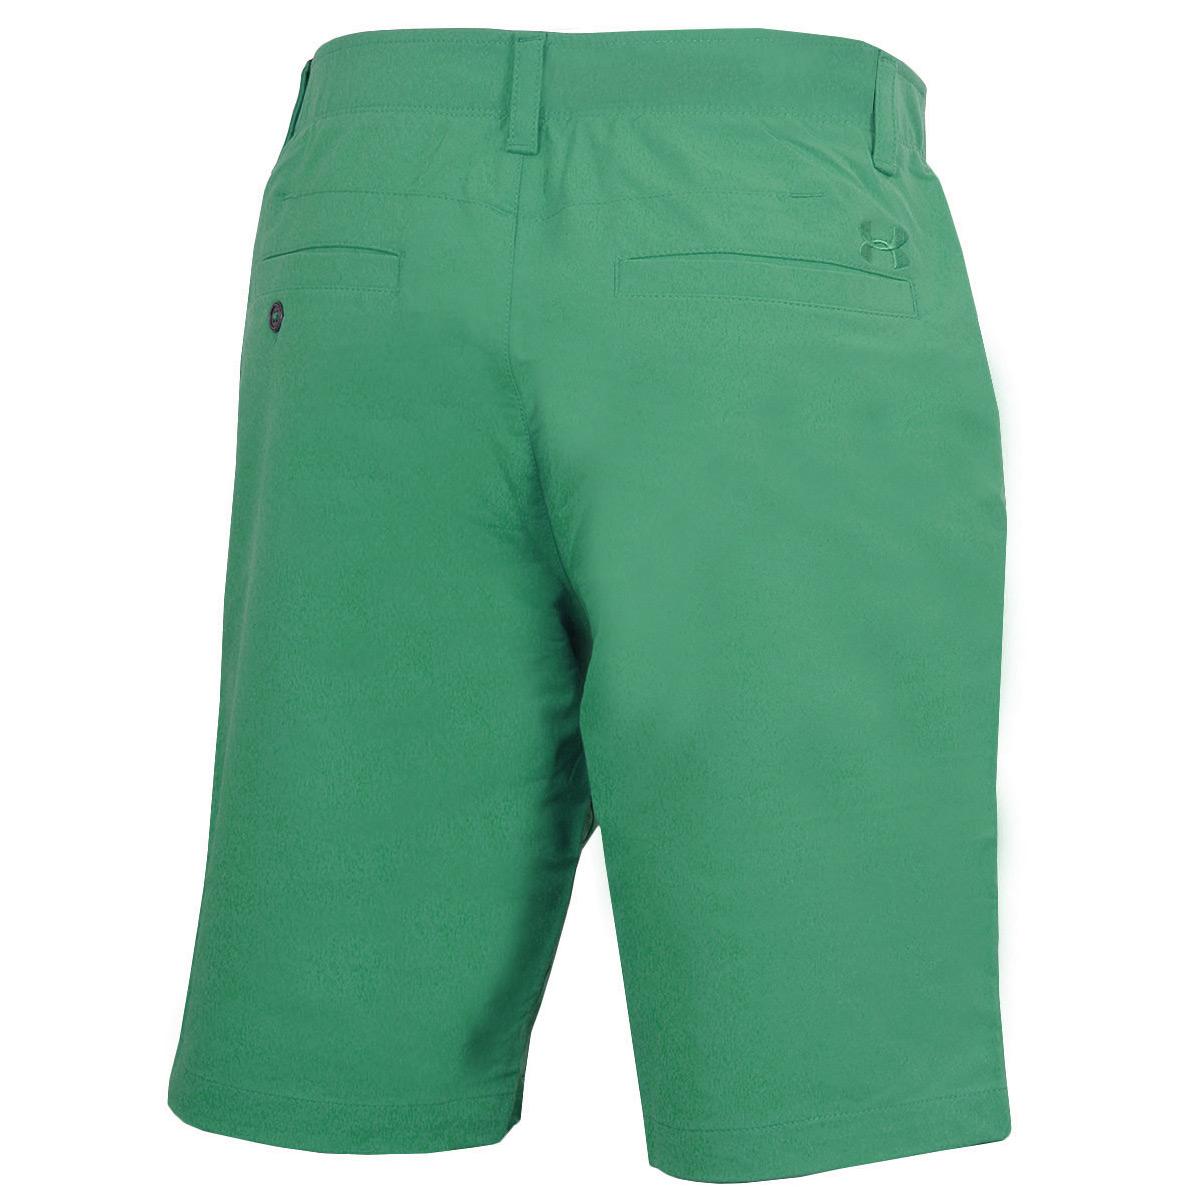 Under-Armour-Homme-UA-Match-Play-conique-Tech-Performance-Golf-Shorts-29-off-RRP miniature 5